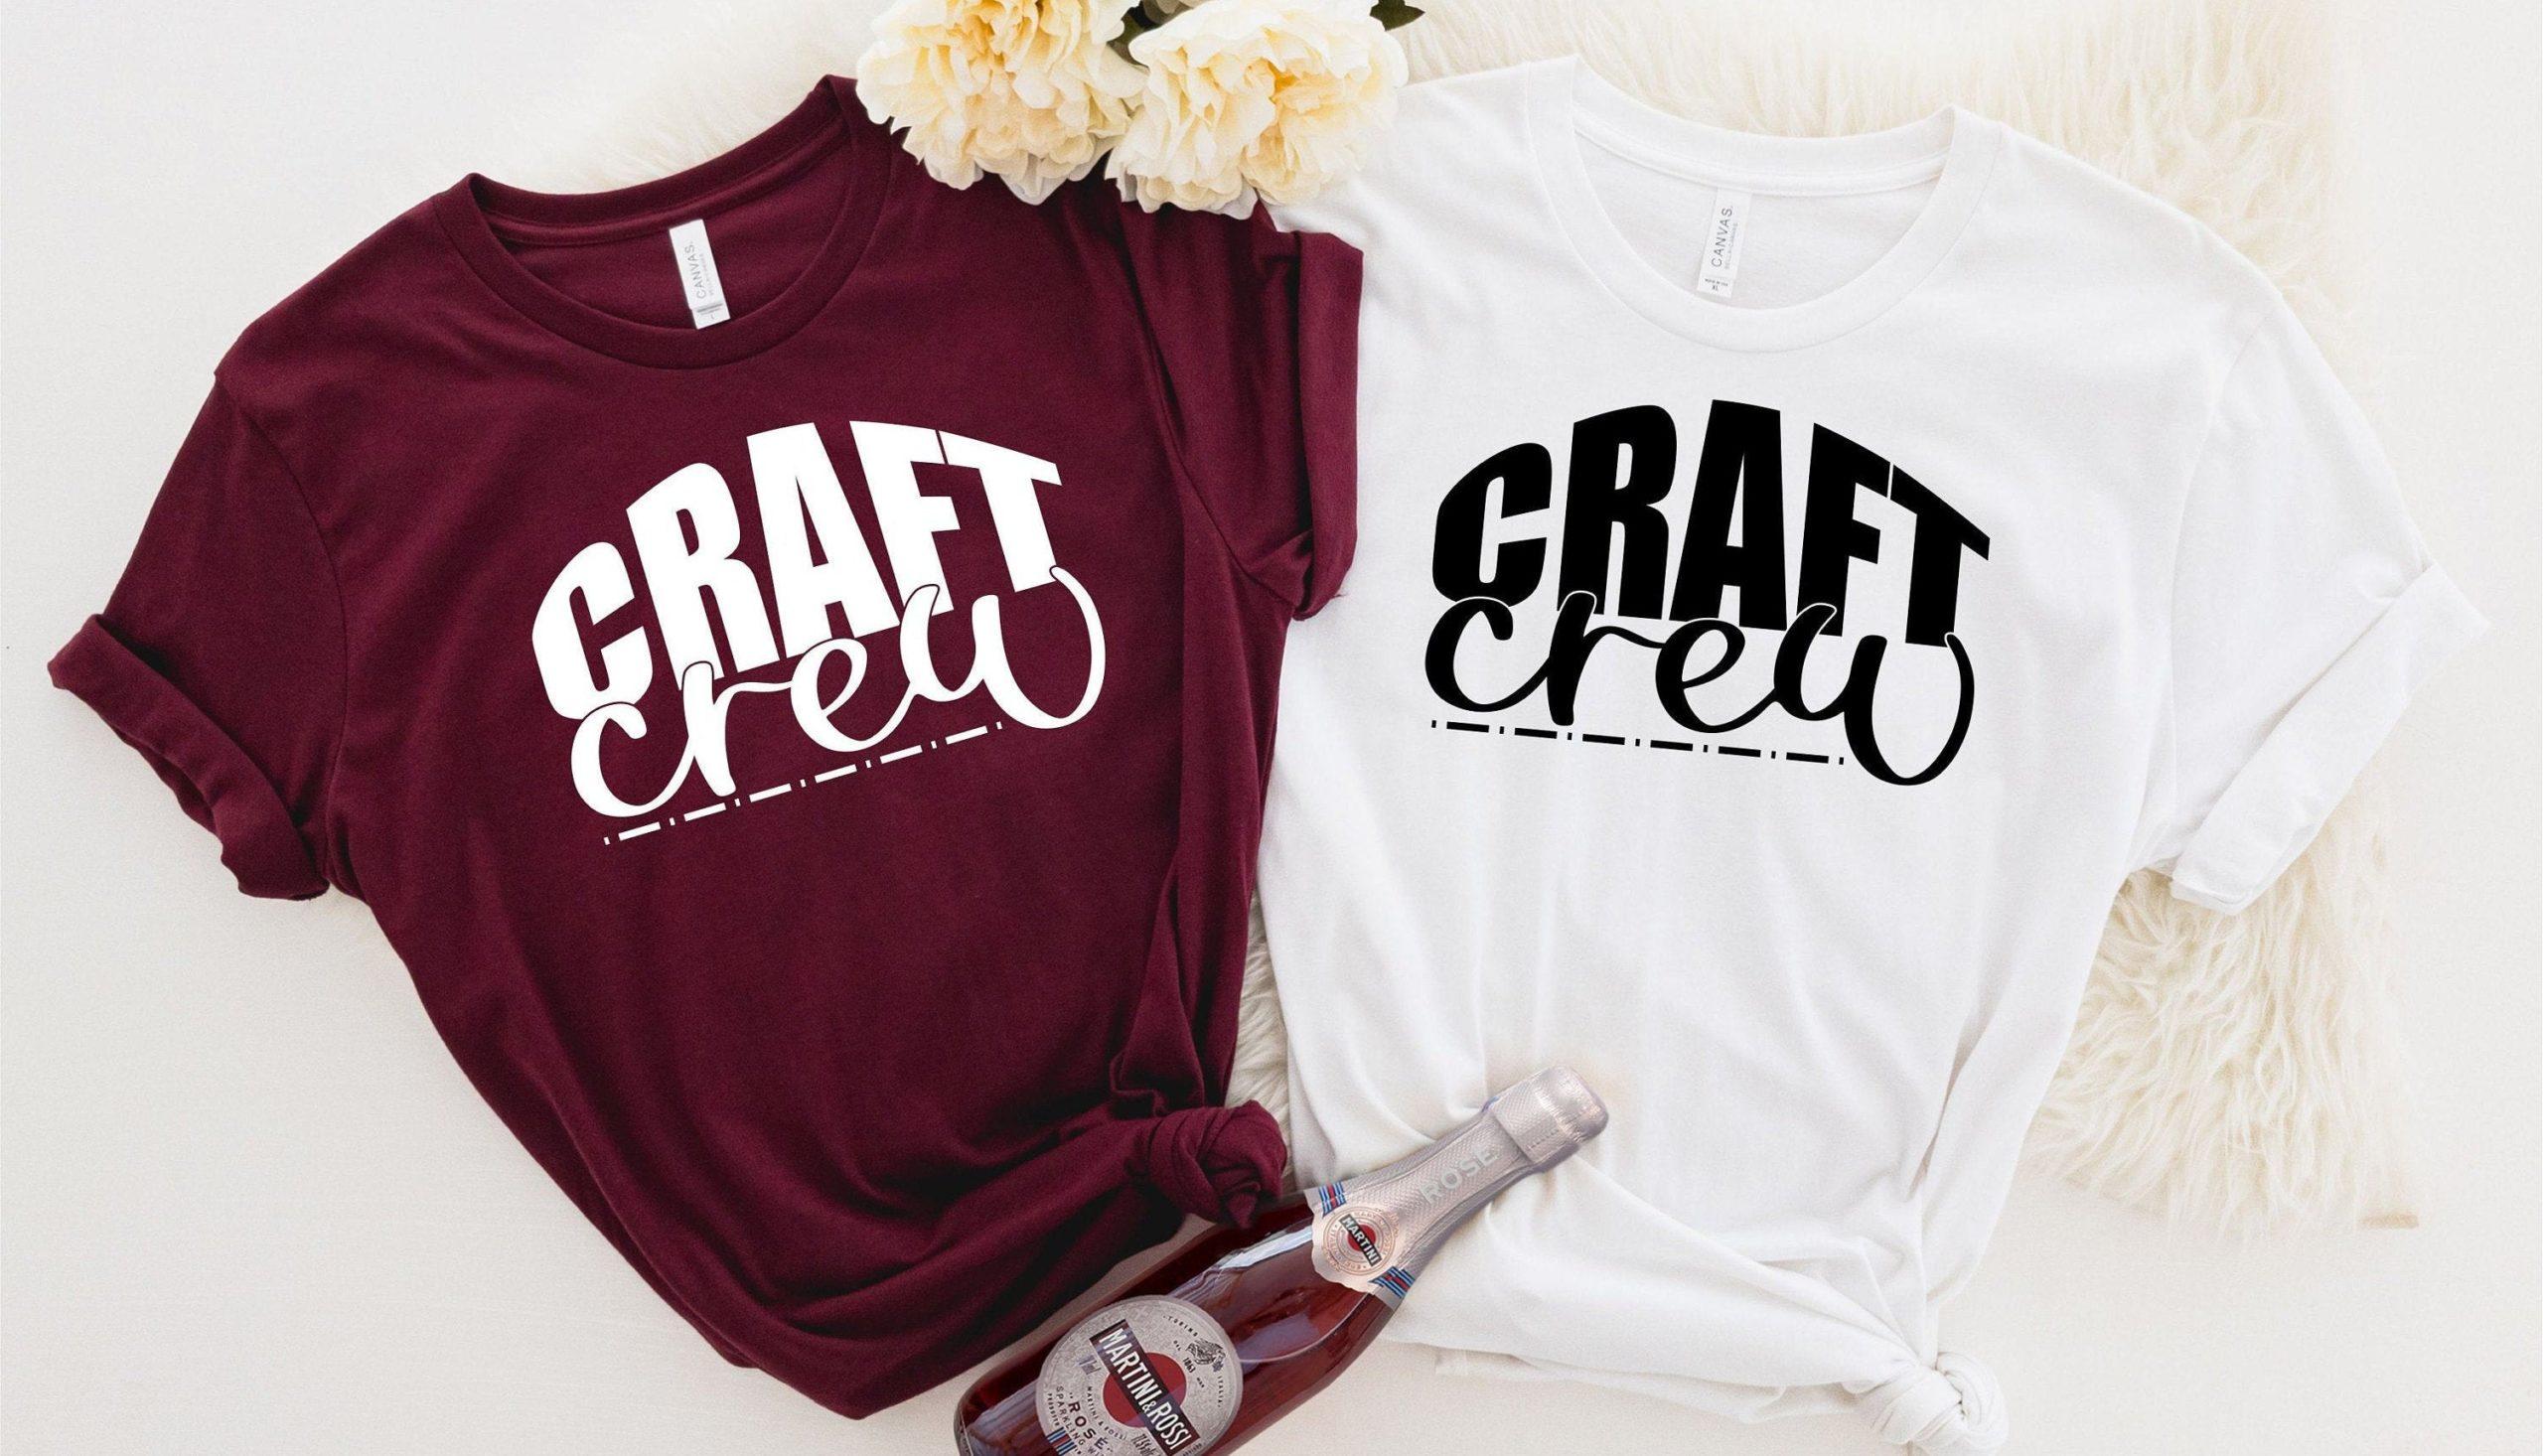 Craft-crew-svg-crew-svg-crafting-svg-crafty-saying-craft-svg-craft-svg-designs-craft-cut-file-craft-svg-for-cricut-60512eb6